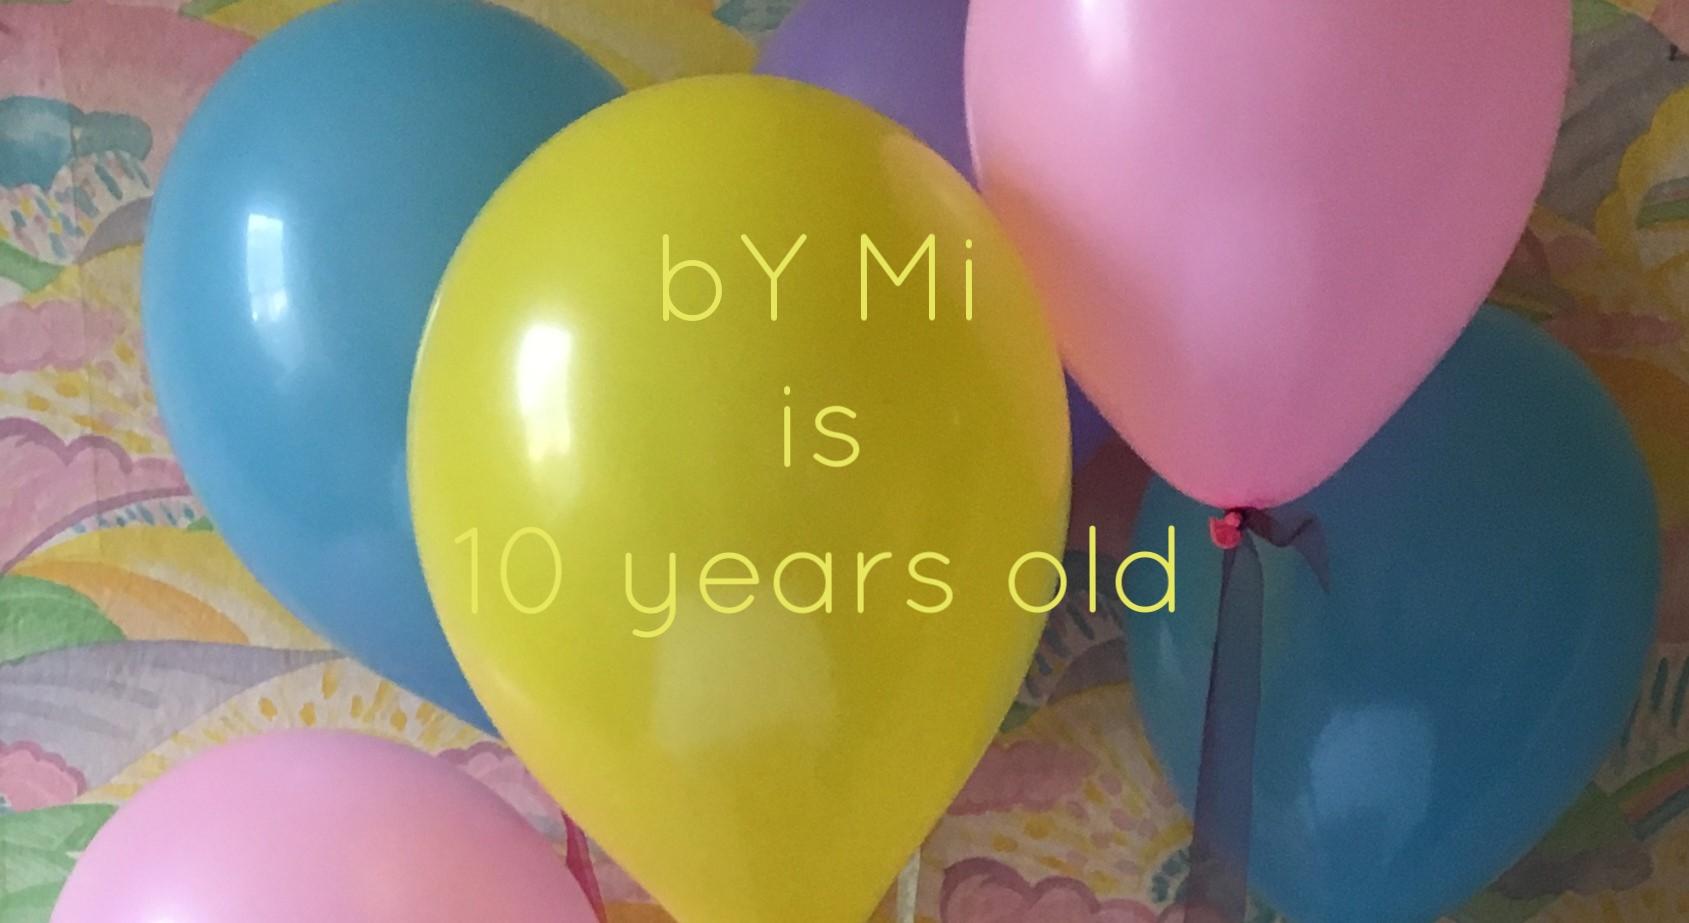 bY Mi 10 year anniversary